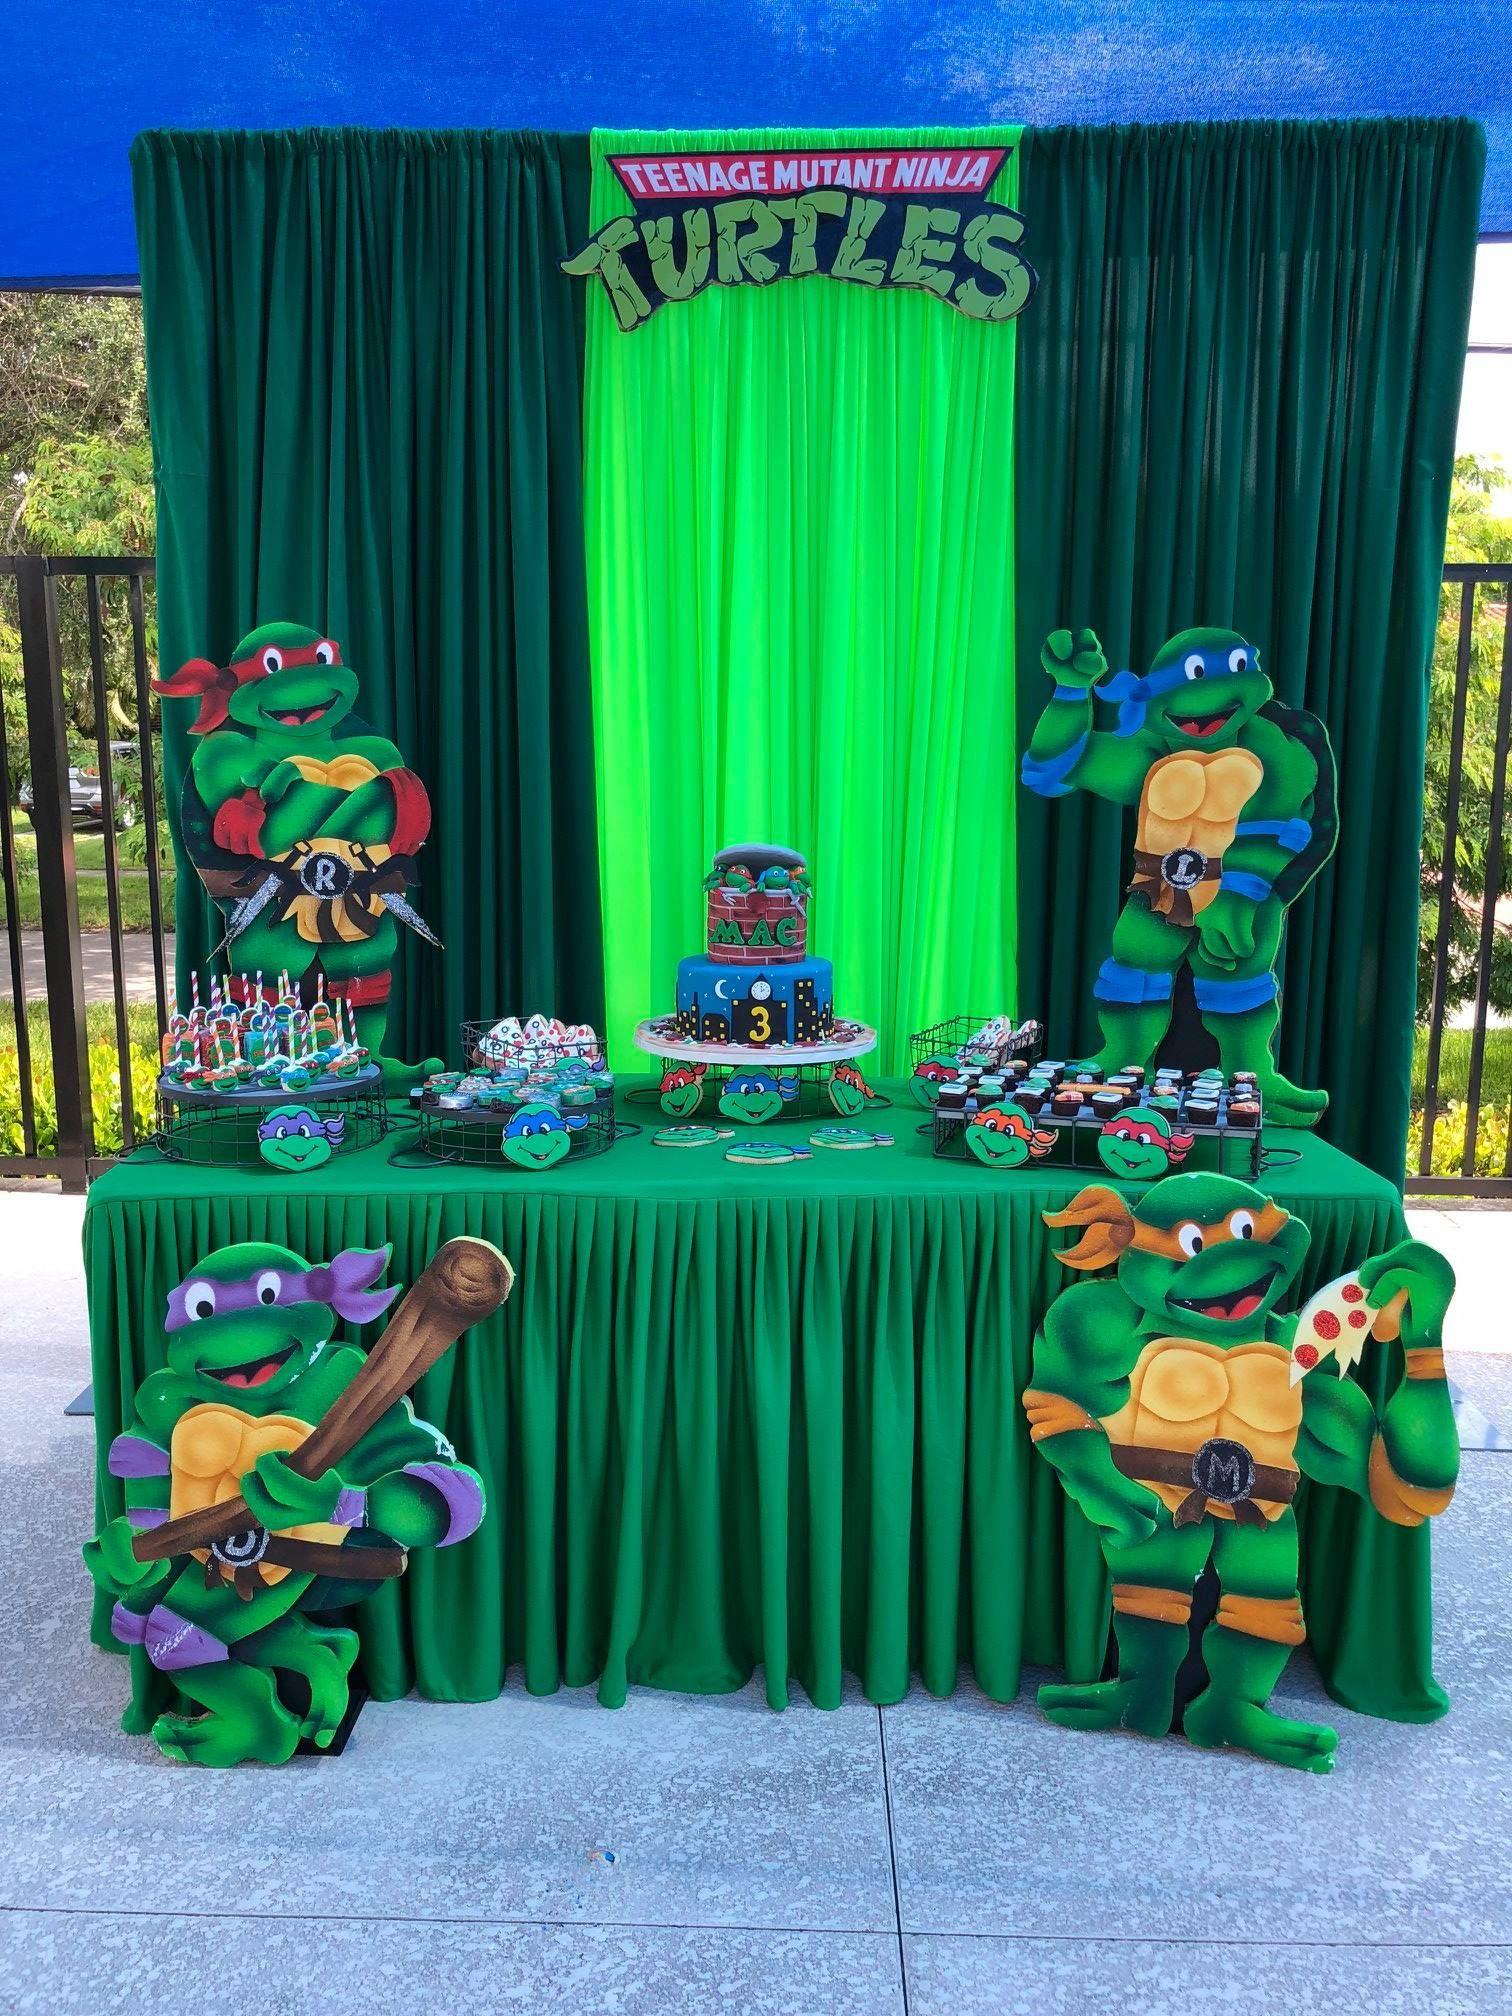 Pin By Ivania Barahona On Ninja Turtles Ninja Turtles Birthday Party Ninja Turtle Theme Party Ninja Turtle Birthday